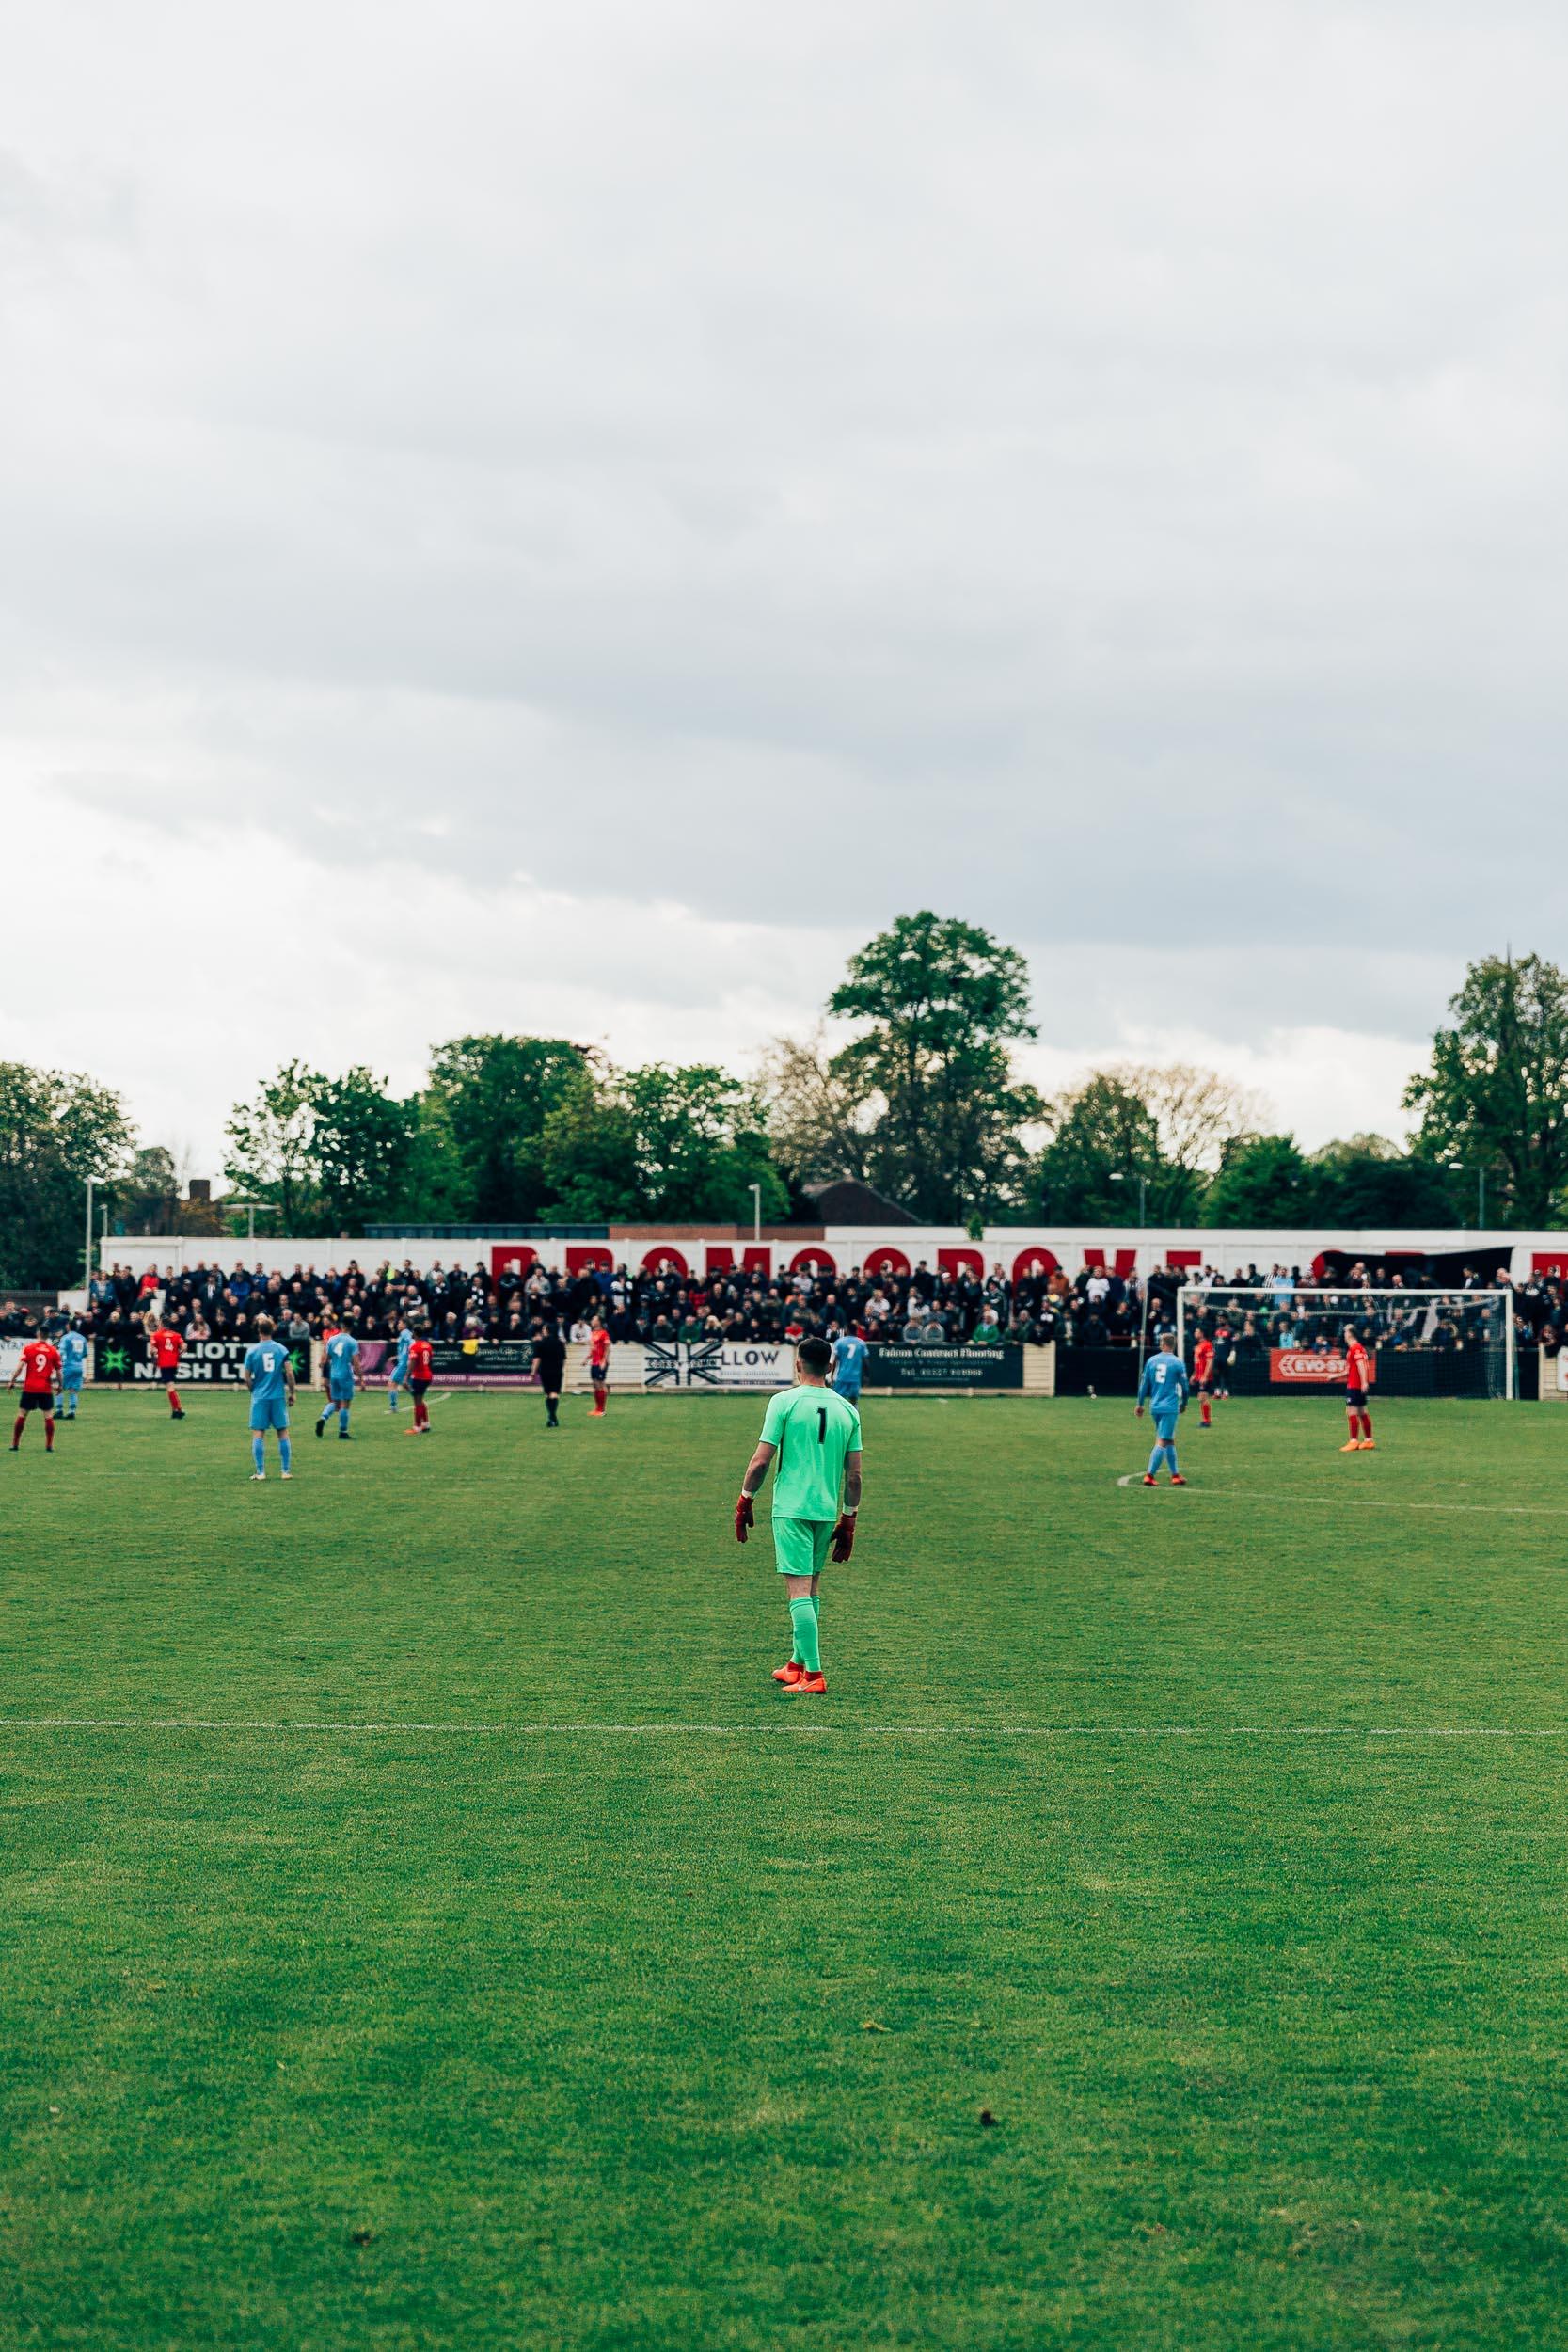 06_05_2019_Bromsgrove_Sporting_Corby-103.jpg